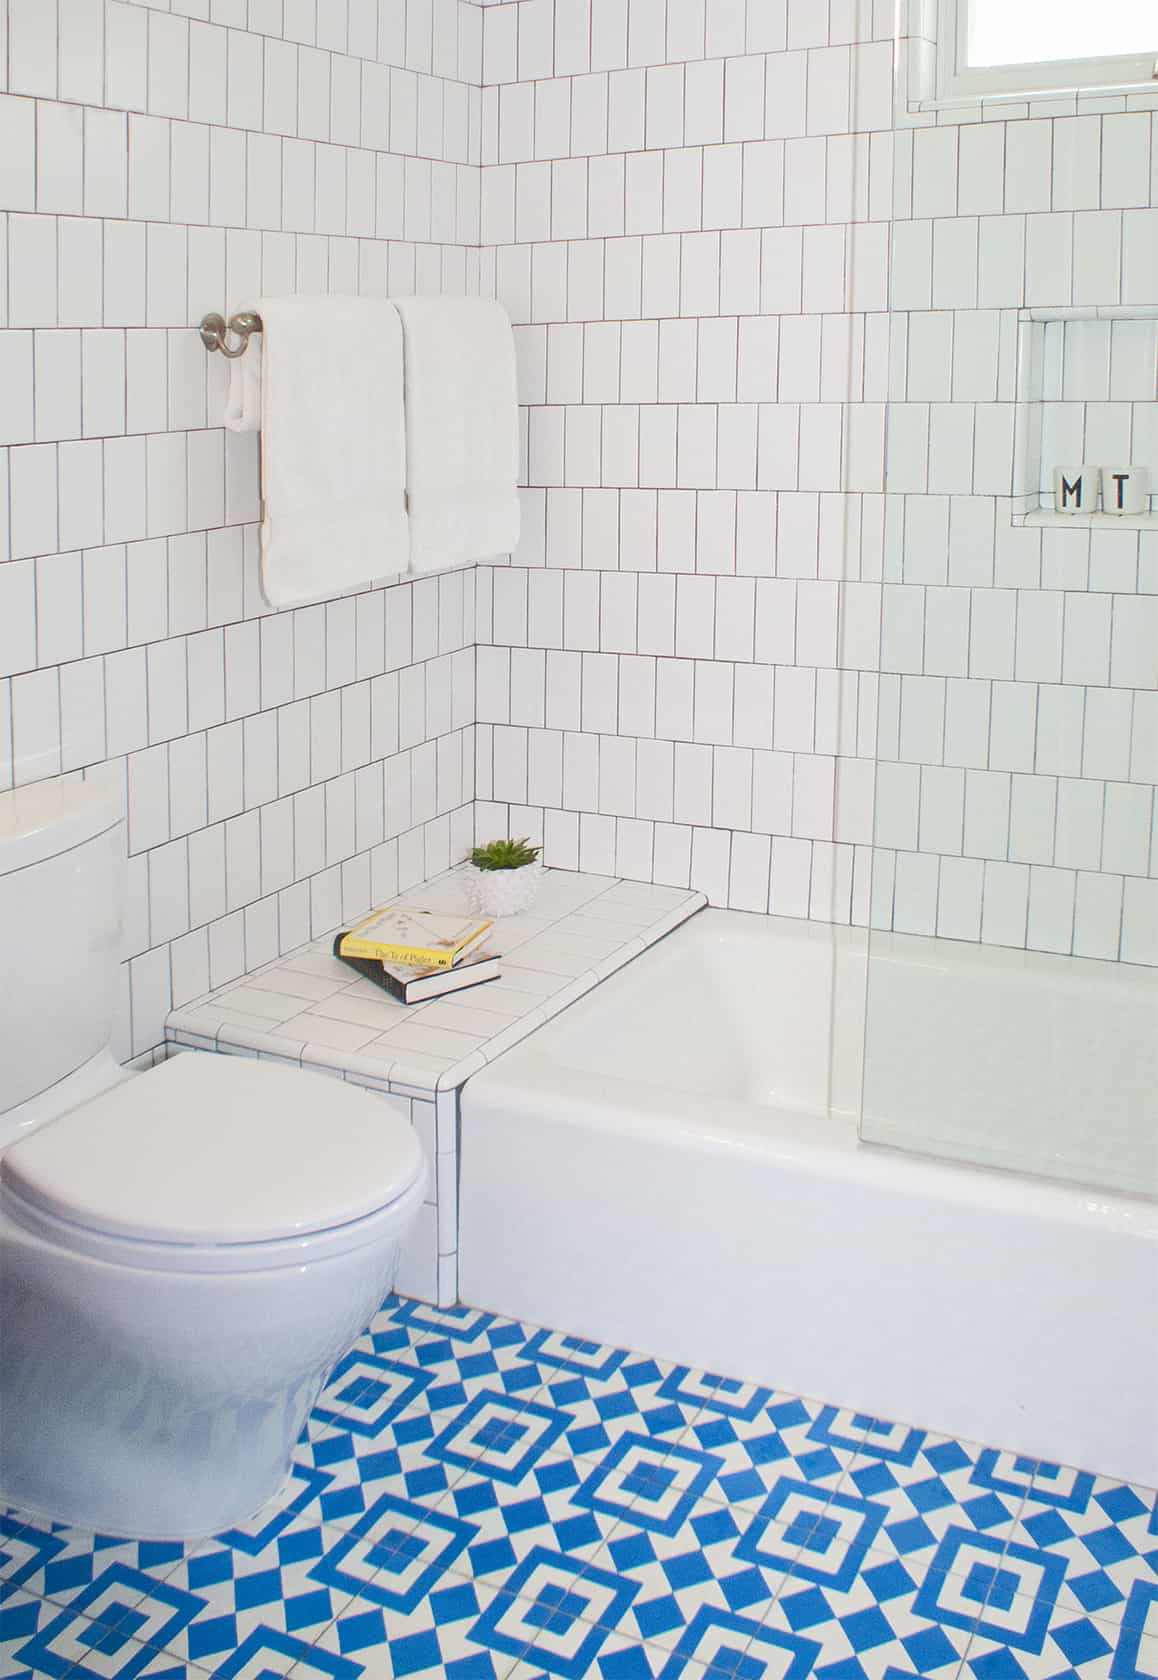 Takaki_Bathroom1